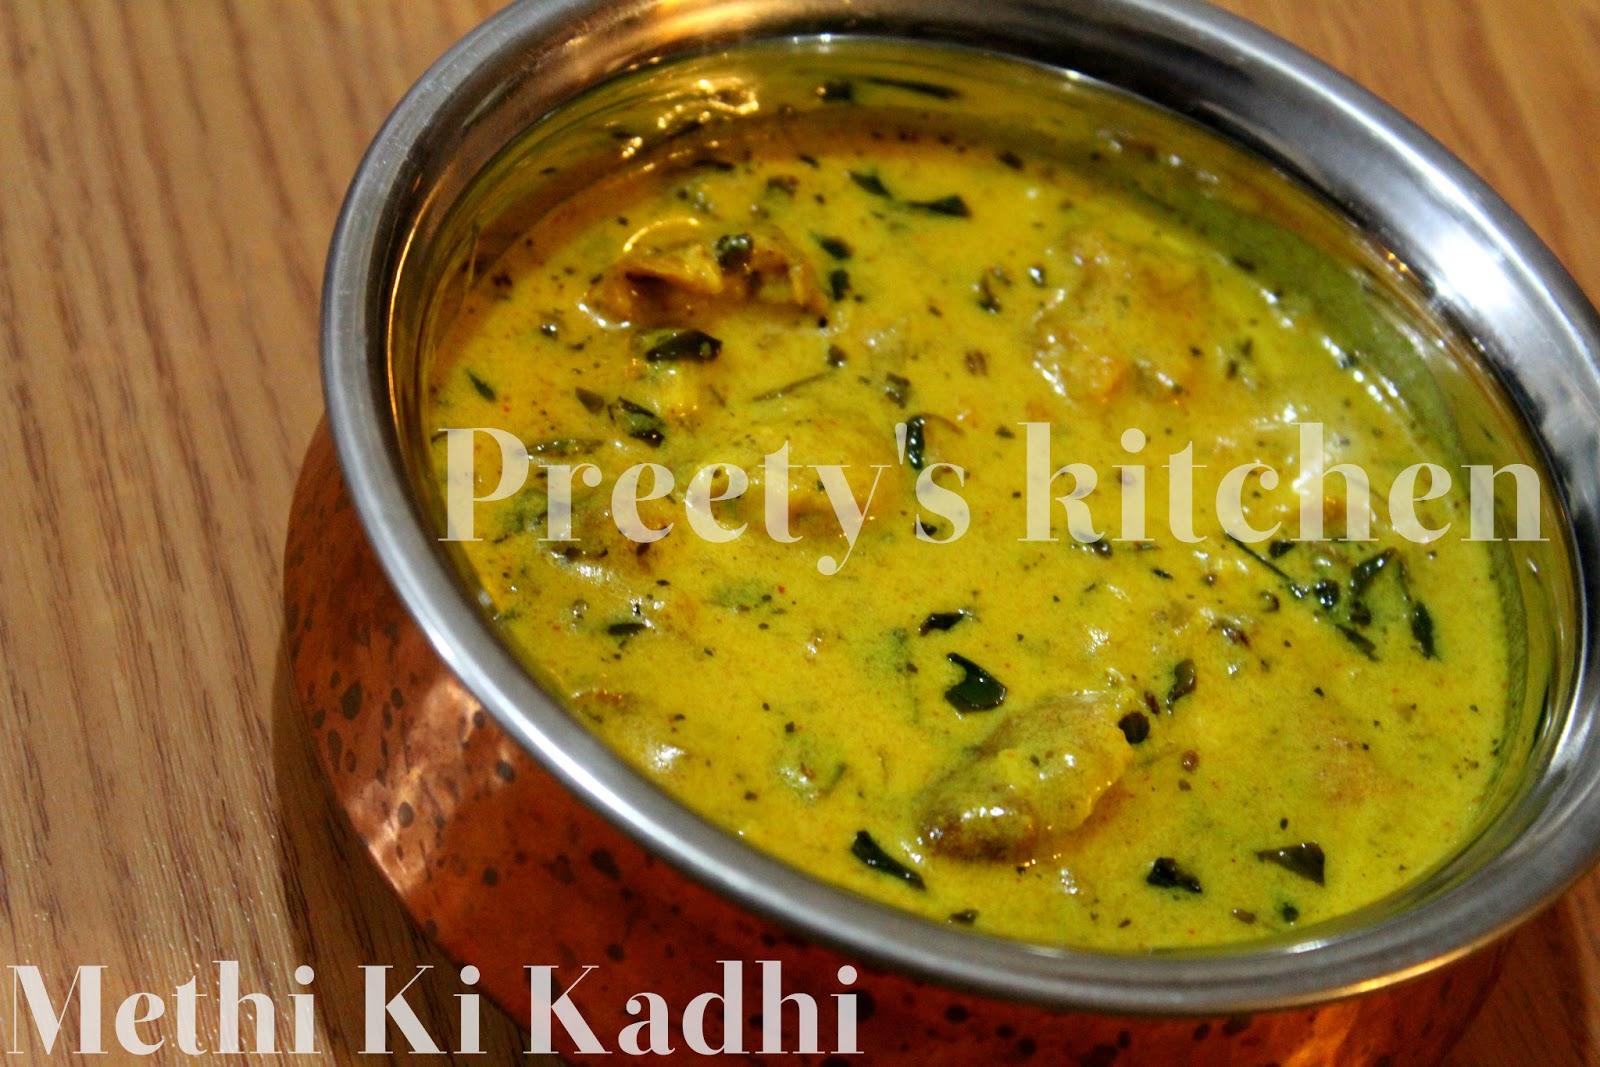 Preetys KitchenMethi Ki Kadhi( Fenugreek Leaves in Yogurt Based